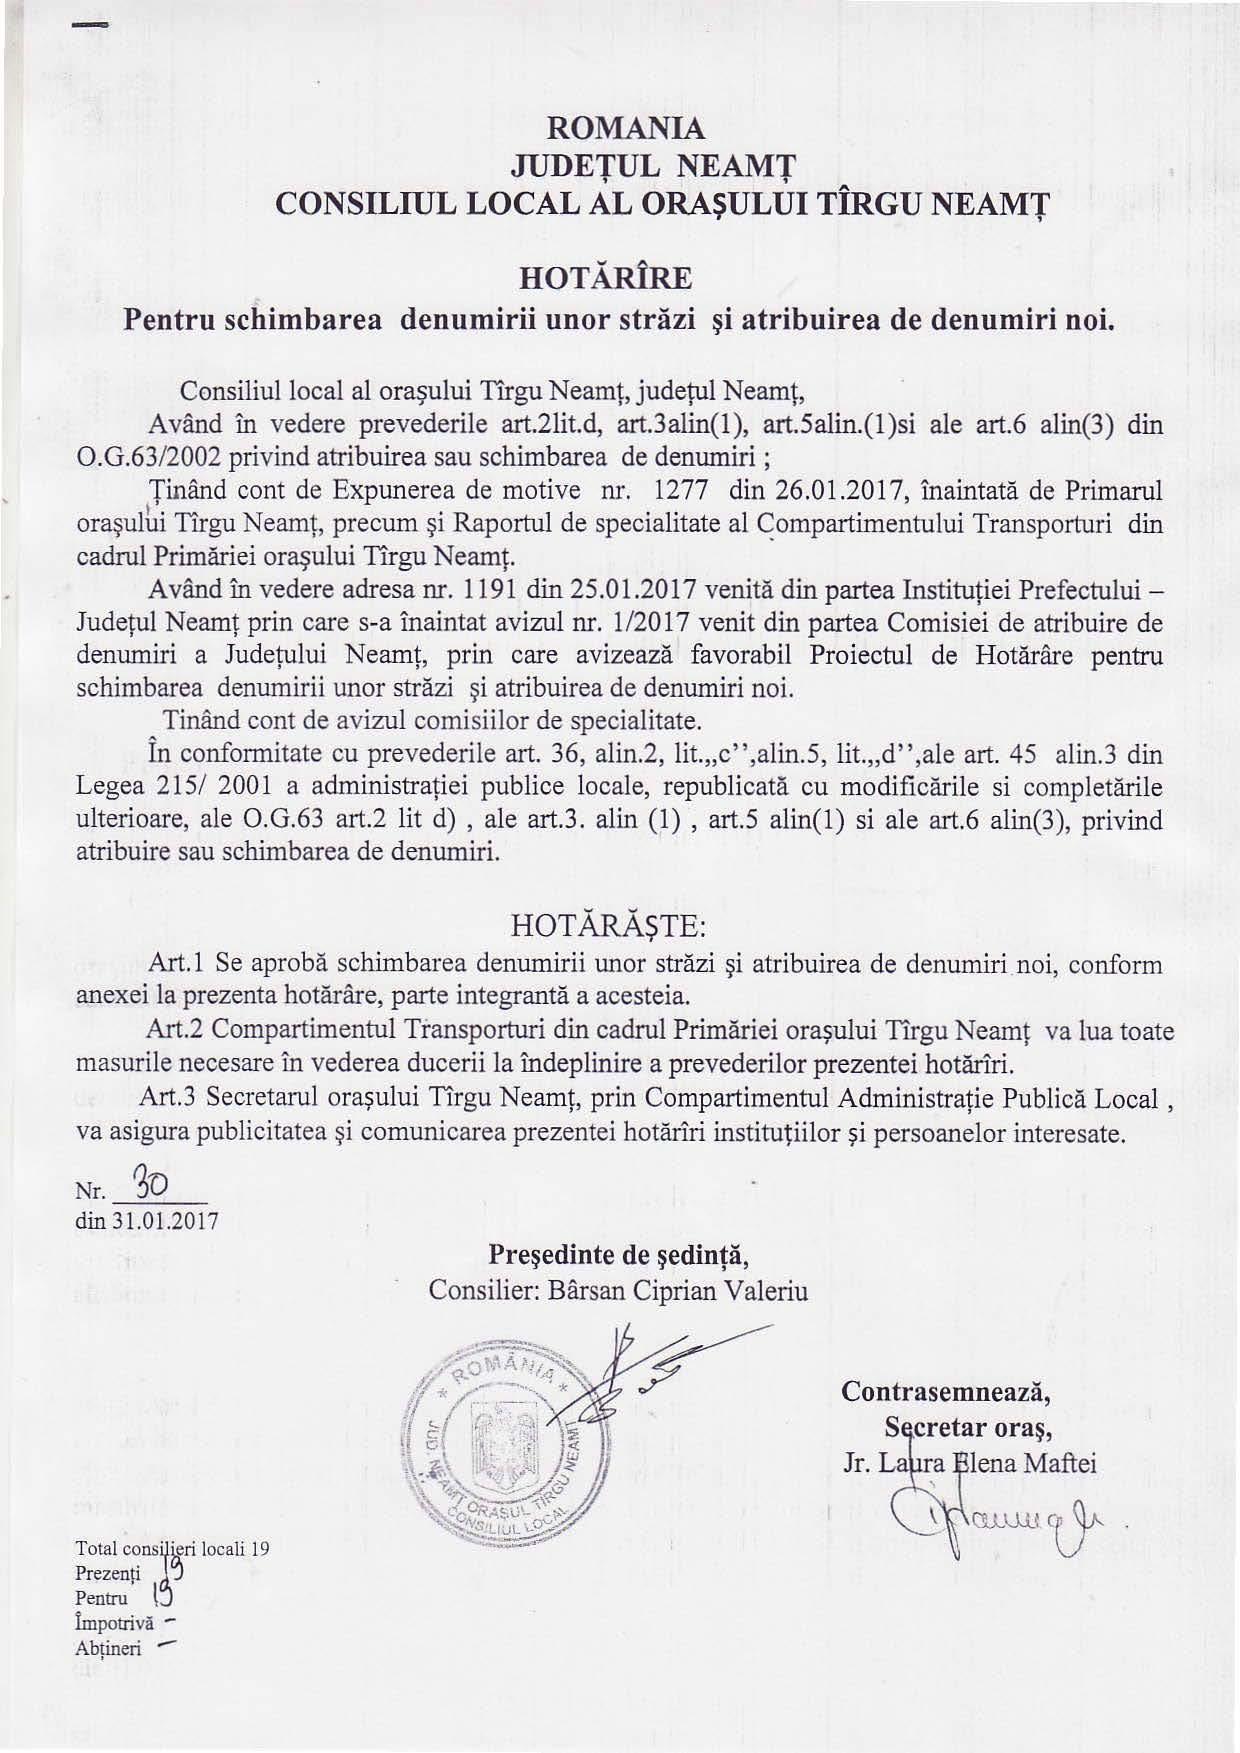 HCL-30-din-31.01.2017_Parintele Justin Parvu Targu Neamt Strada